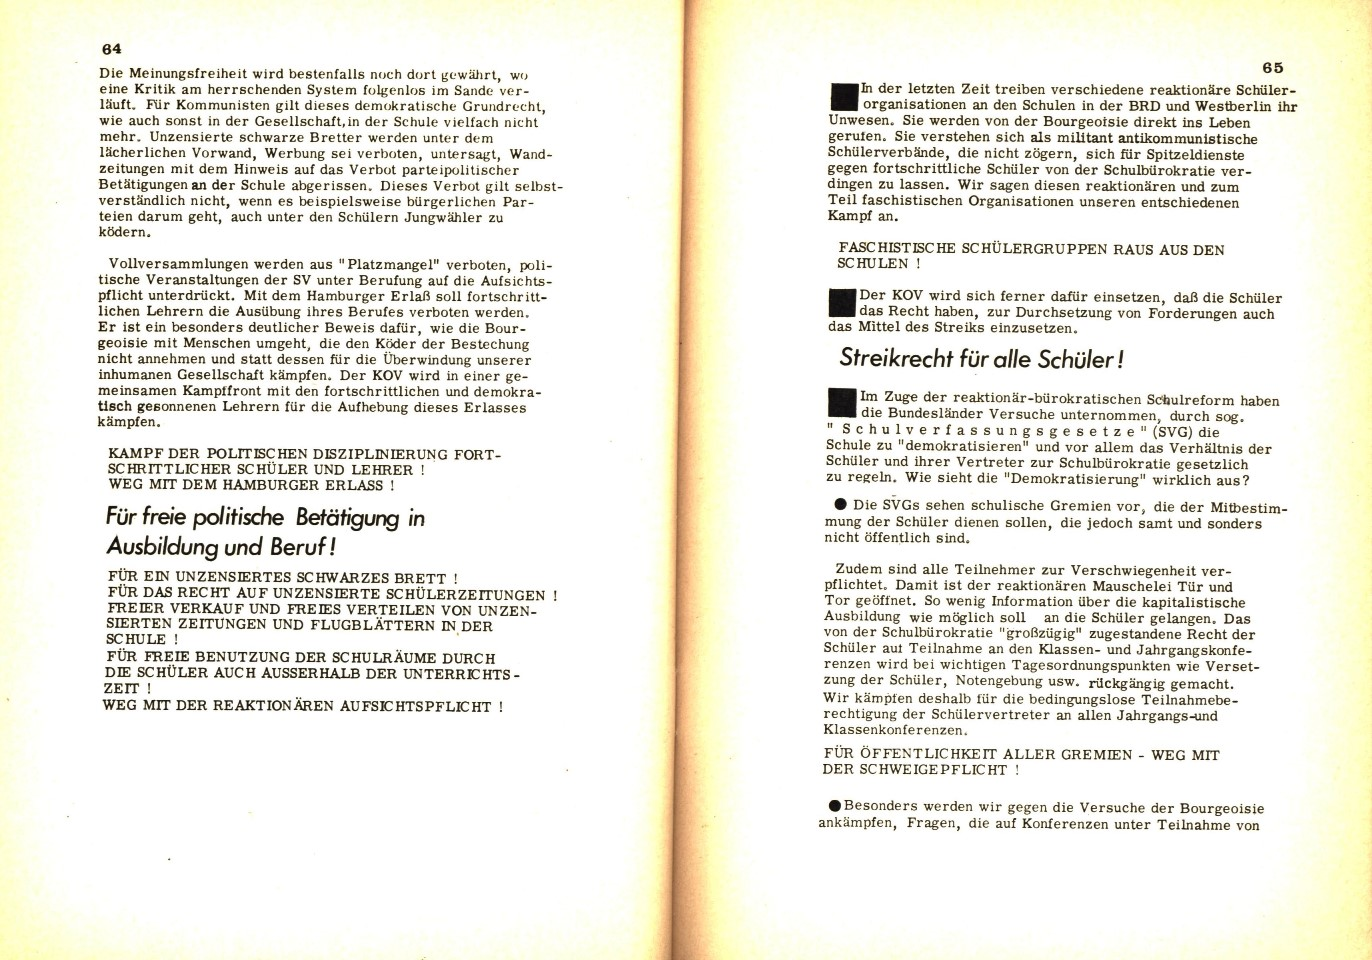 KOV_1973_Aktionsprogramm_35